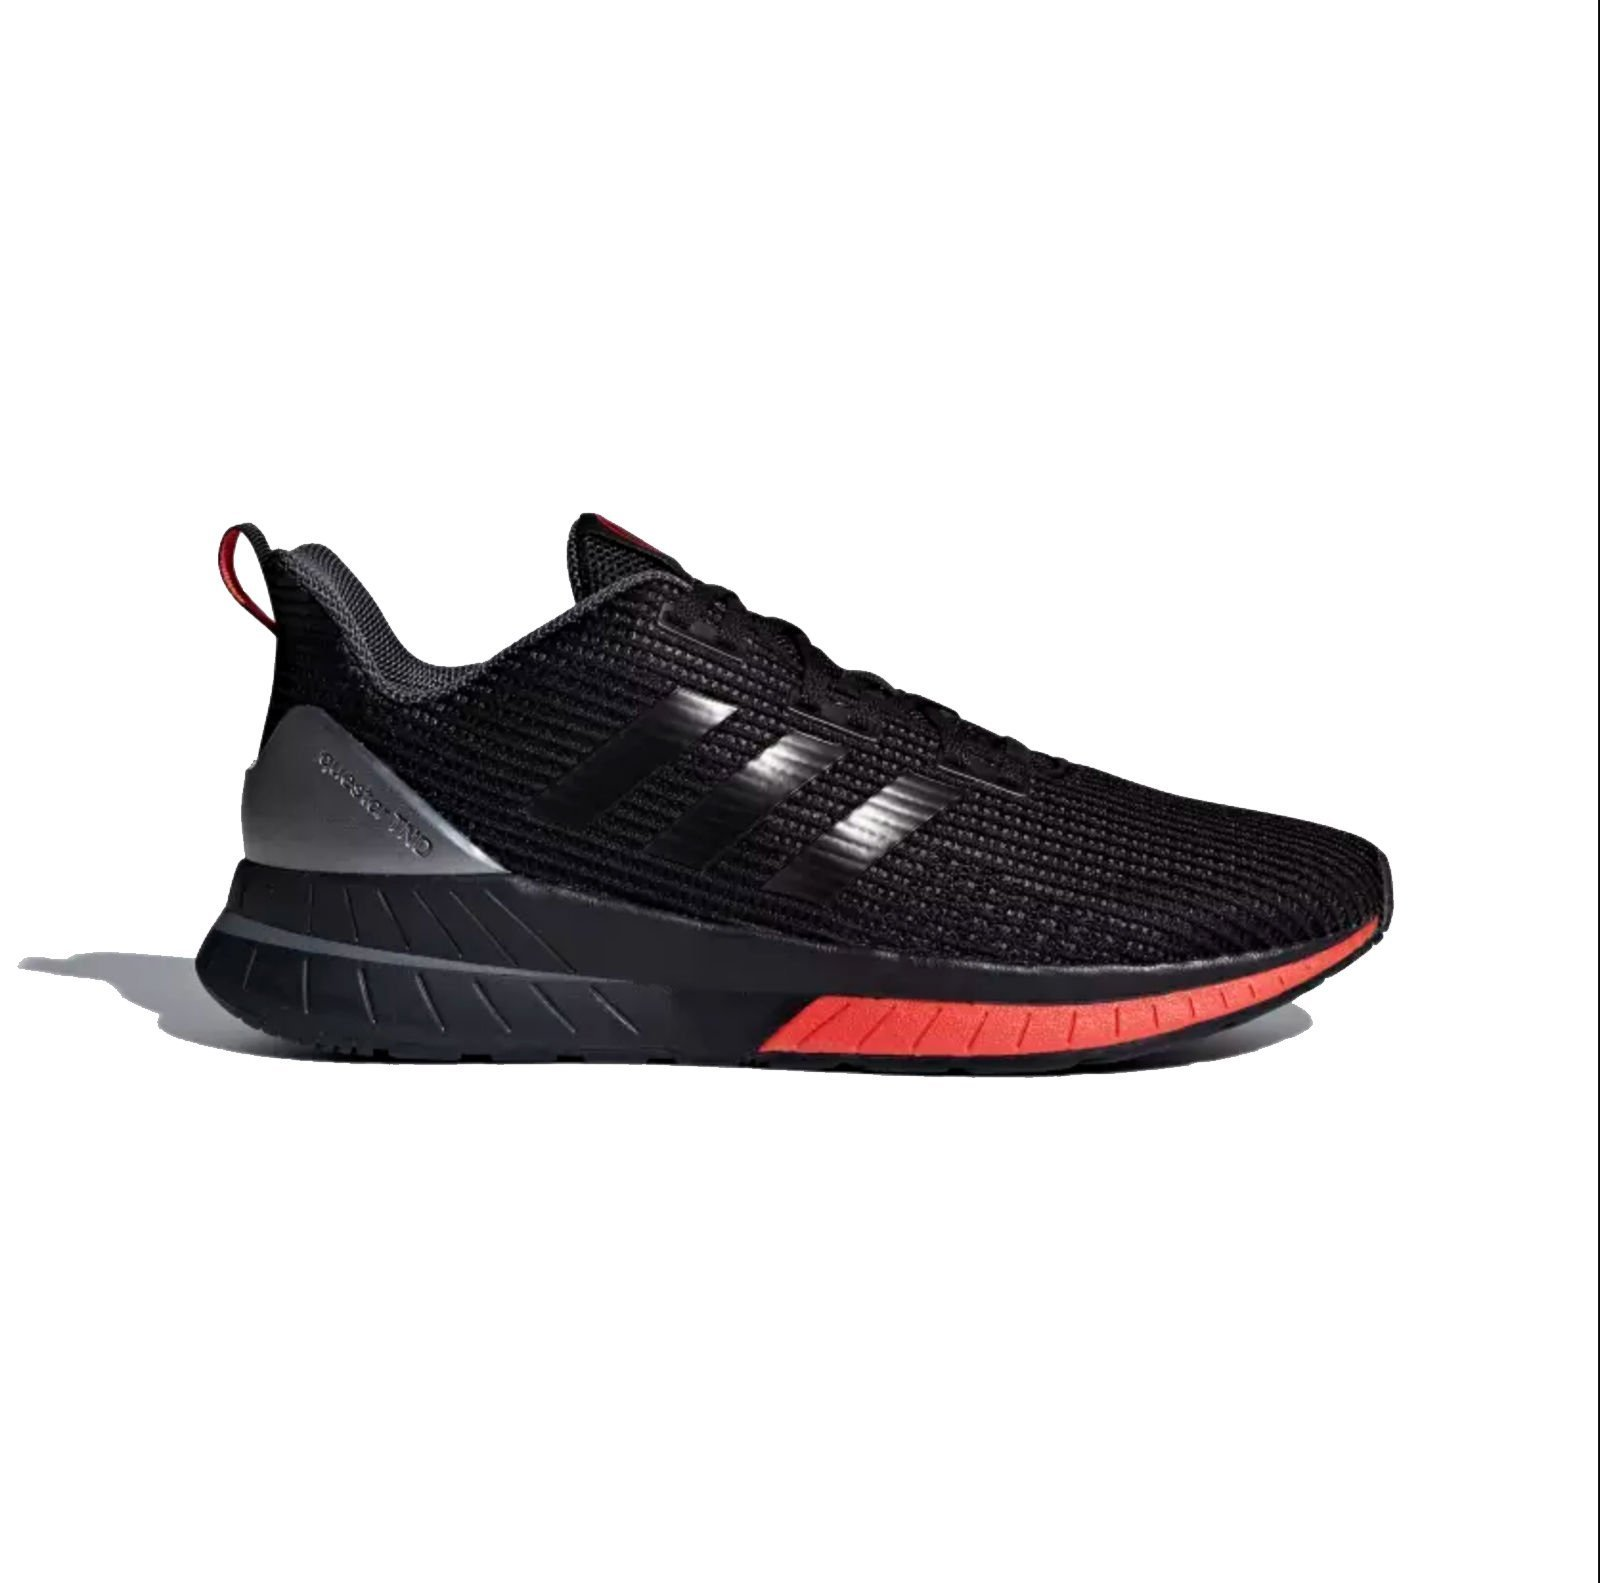 adidas Men's Questar Tnd, Core Black/Core Black/Core Red, 9 Medium US by adidas